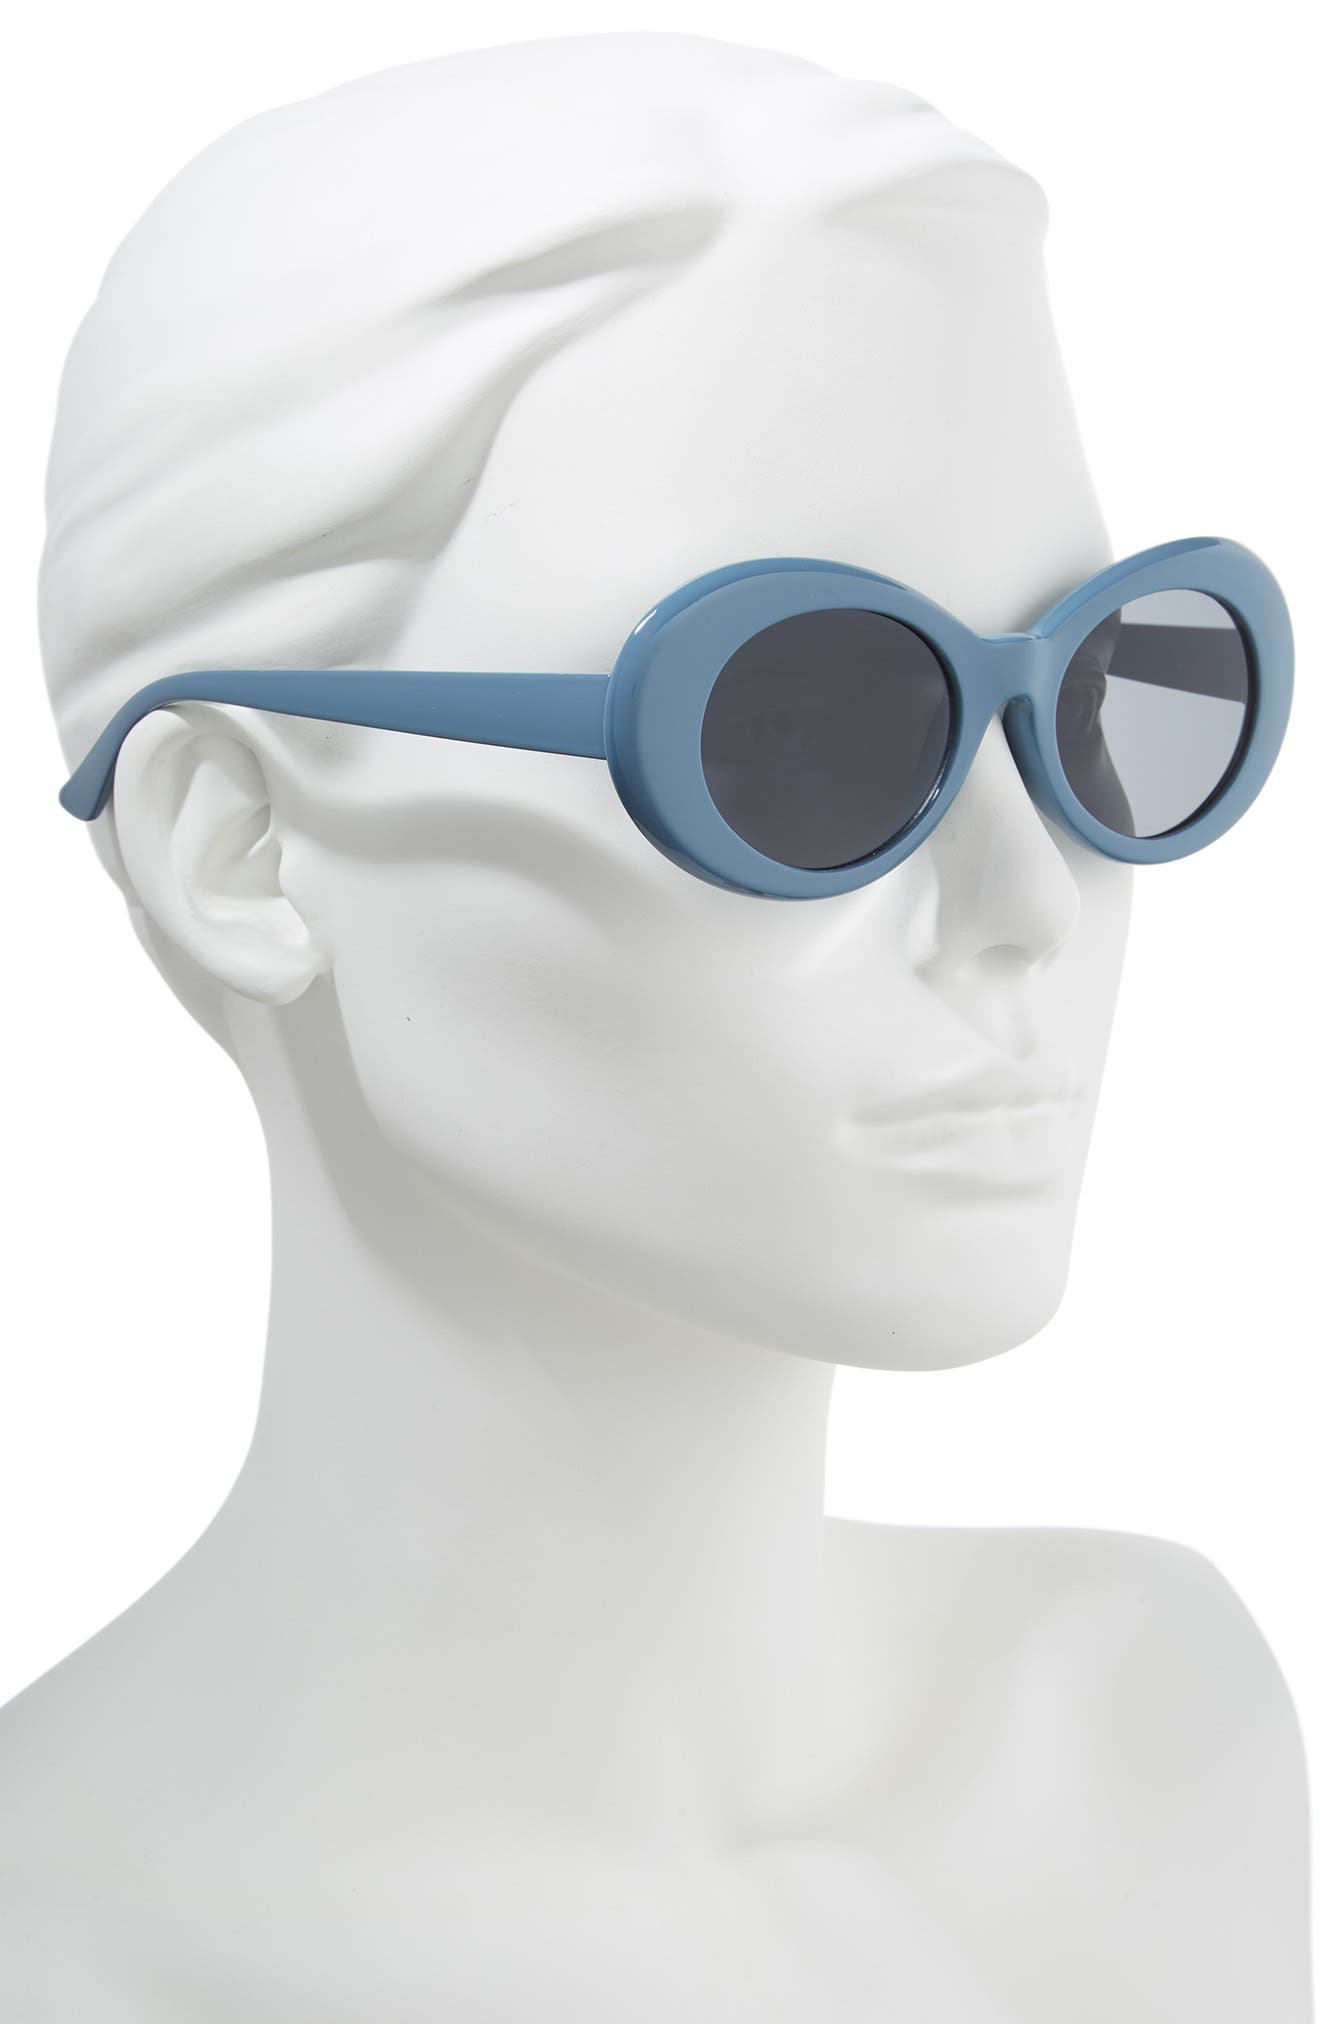 50mm Round Sunglasses,                             Alternate thumbnail 2, color,                             MARINE BLUE